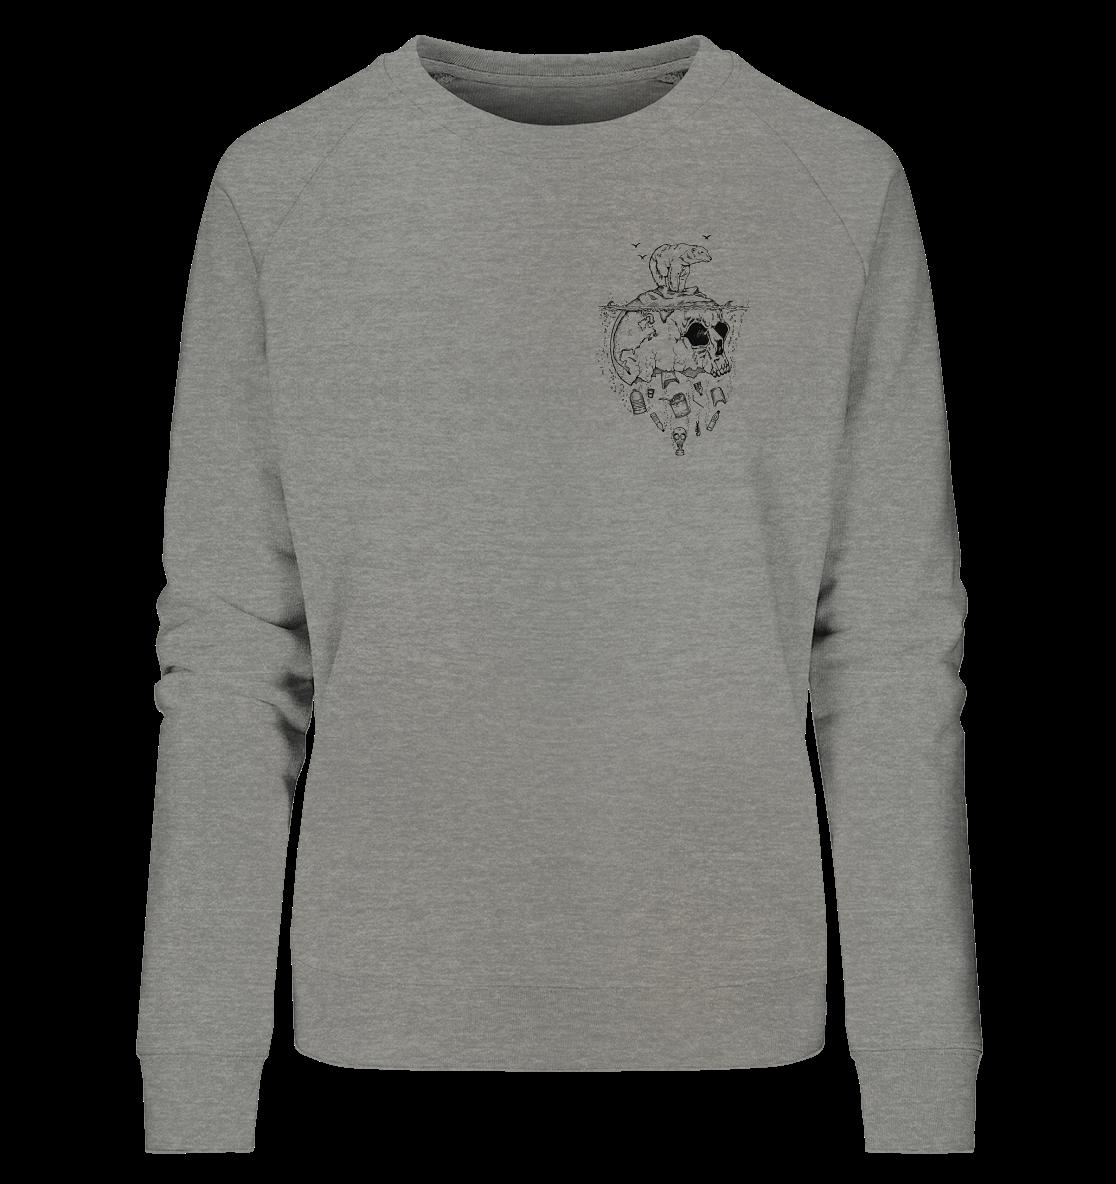 front-ladies-organic-sweatshirt-818381-1116x-32.png